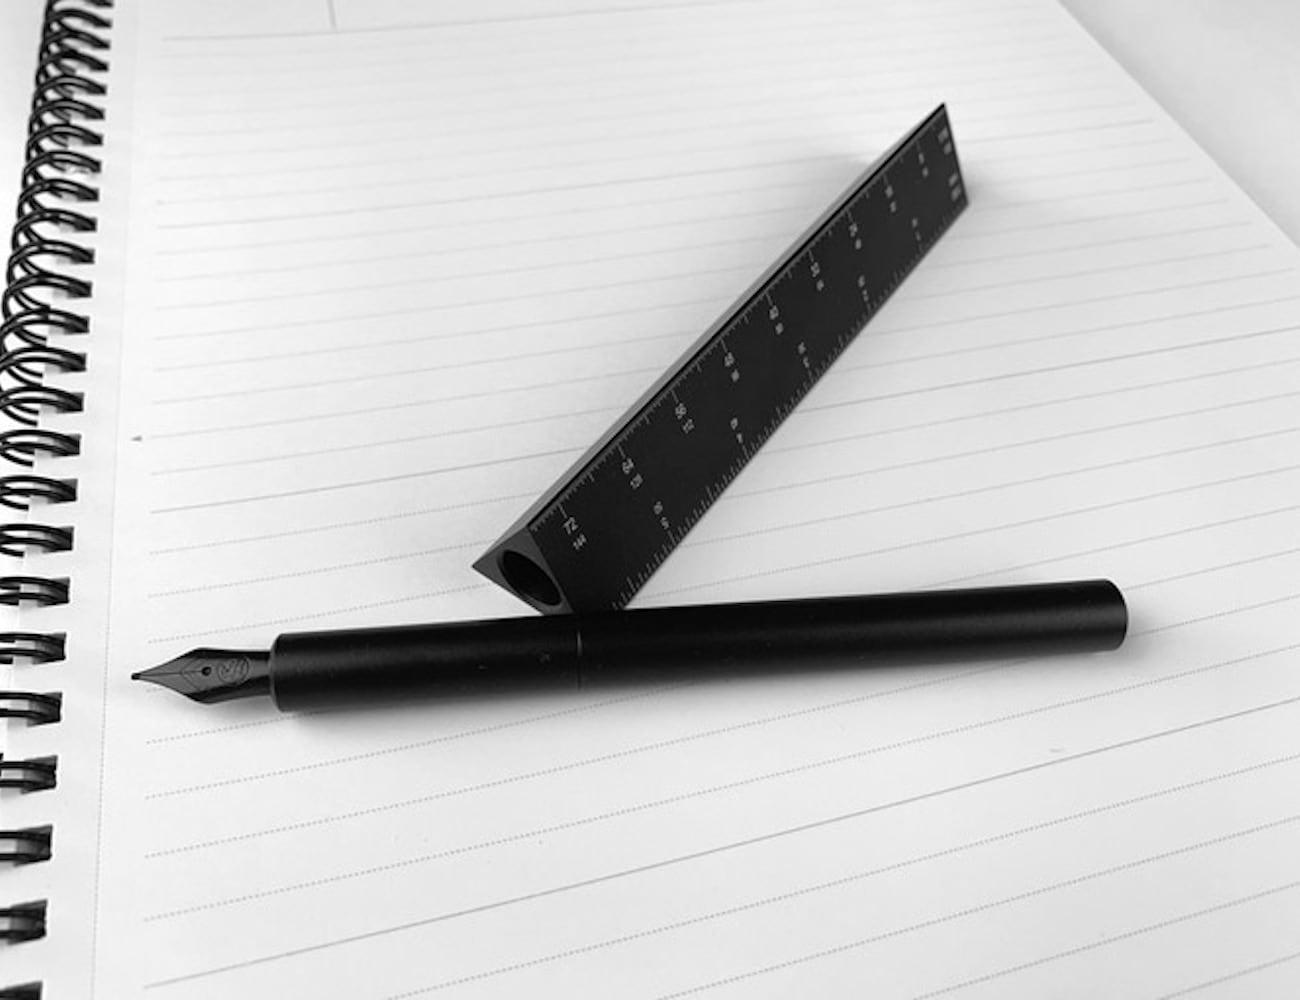 Architect S Scale Ruler Worksheet